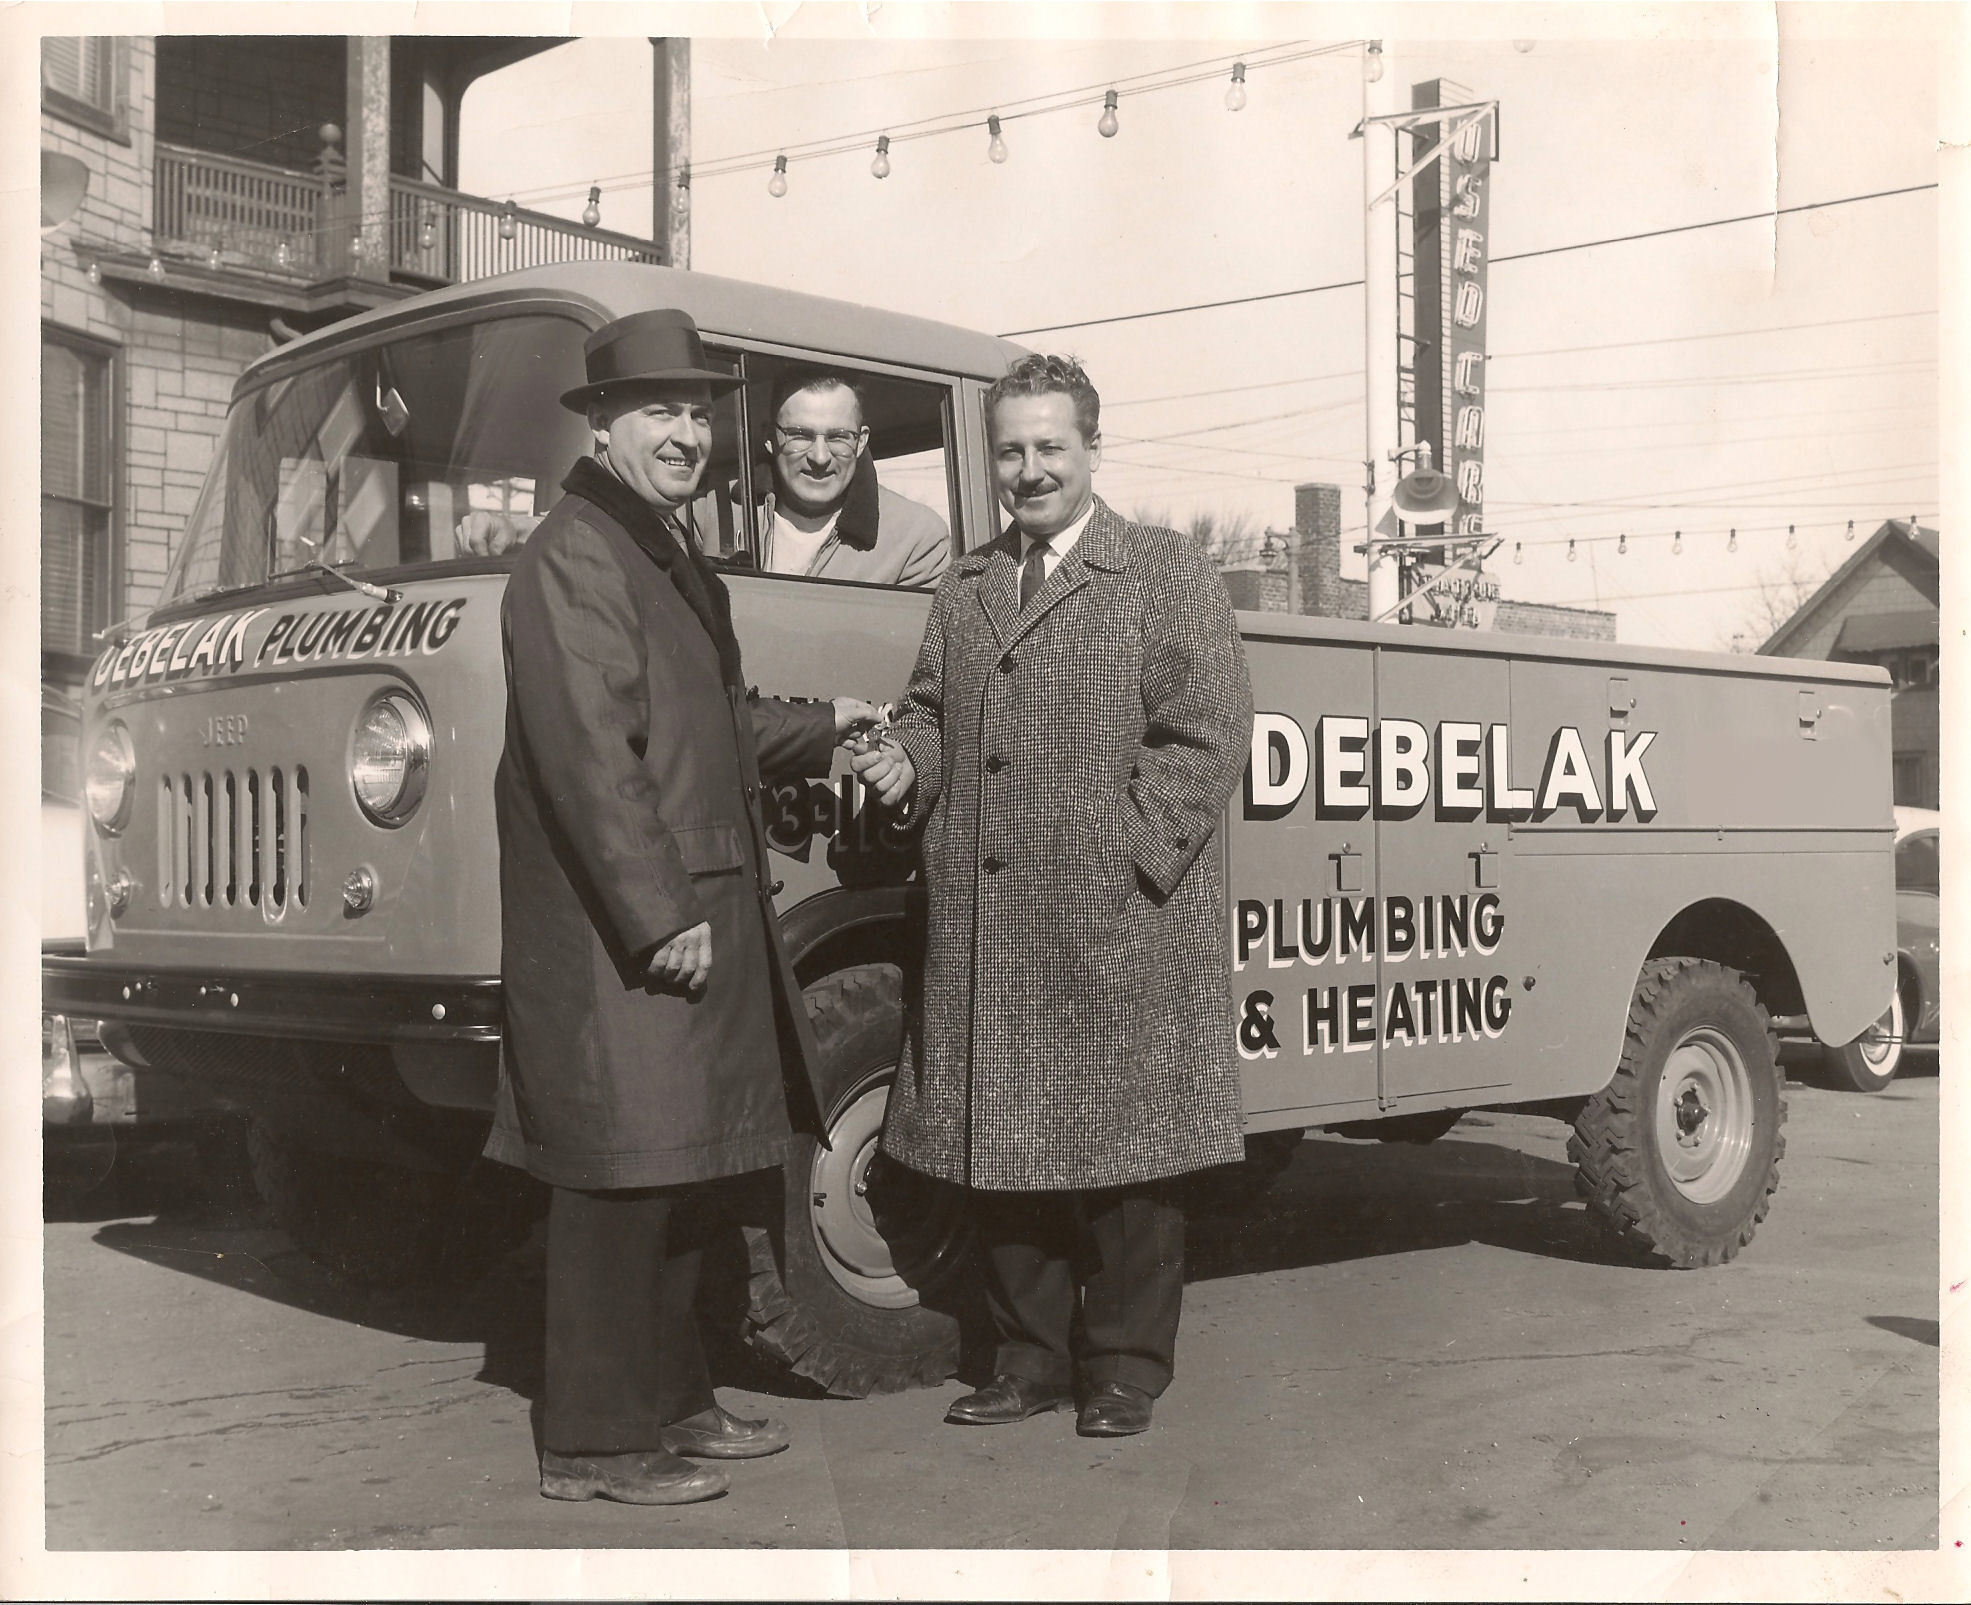 Plumbing & Heating Services in Southeastern WIsconsin | Joe DeBelak Plumbing & Heating